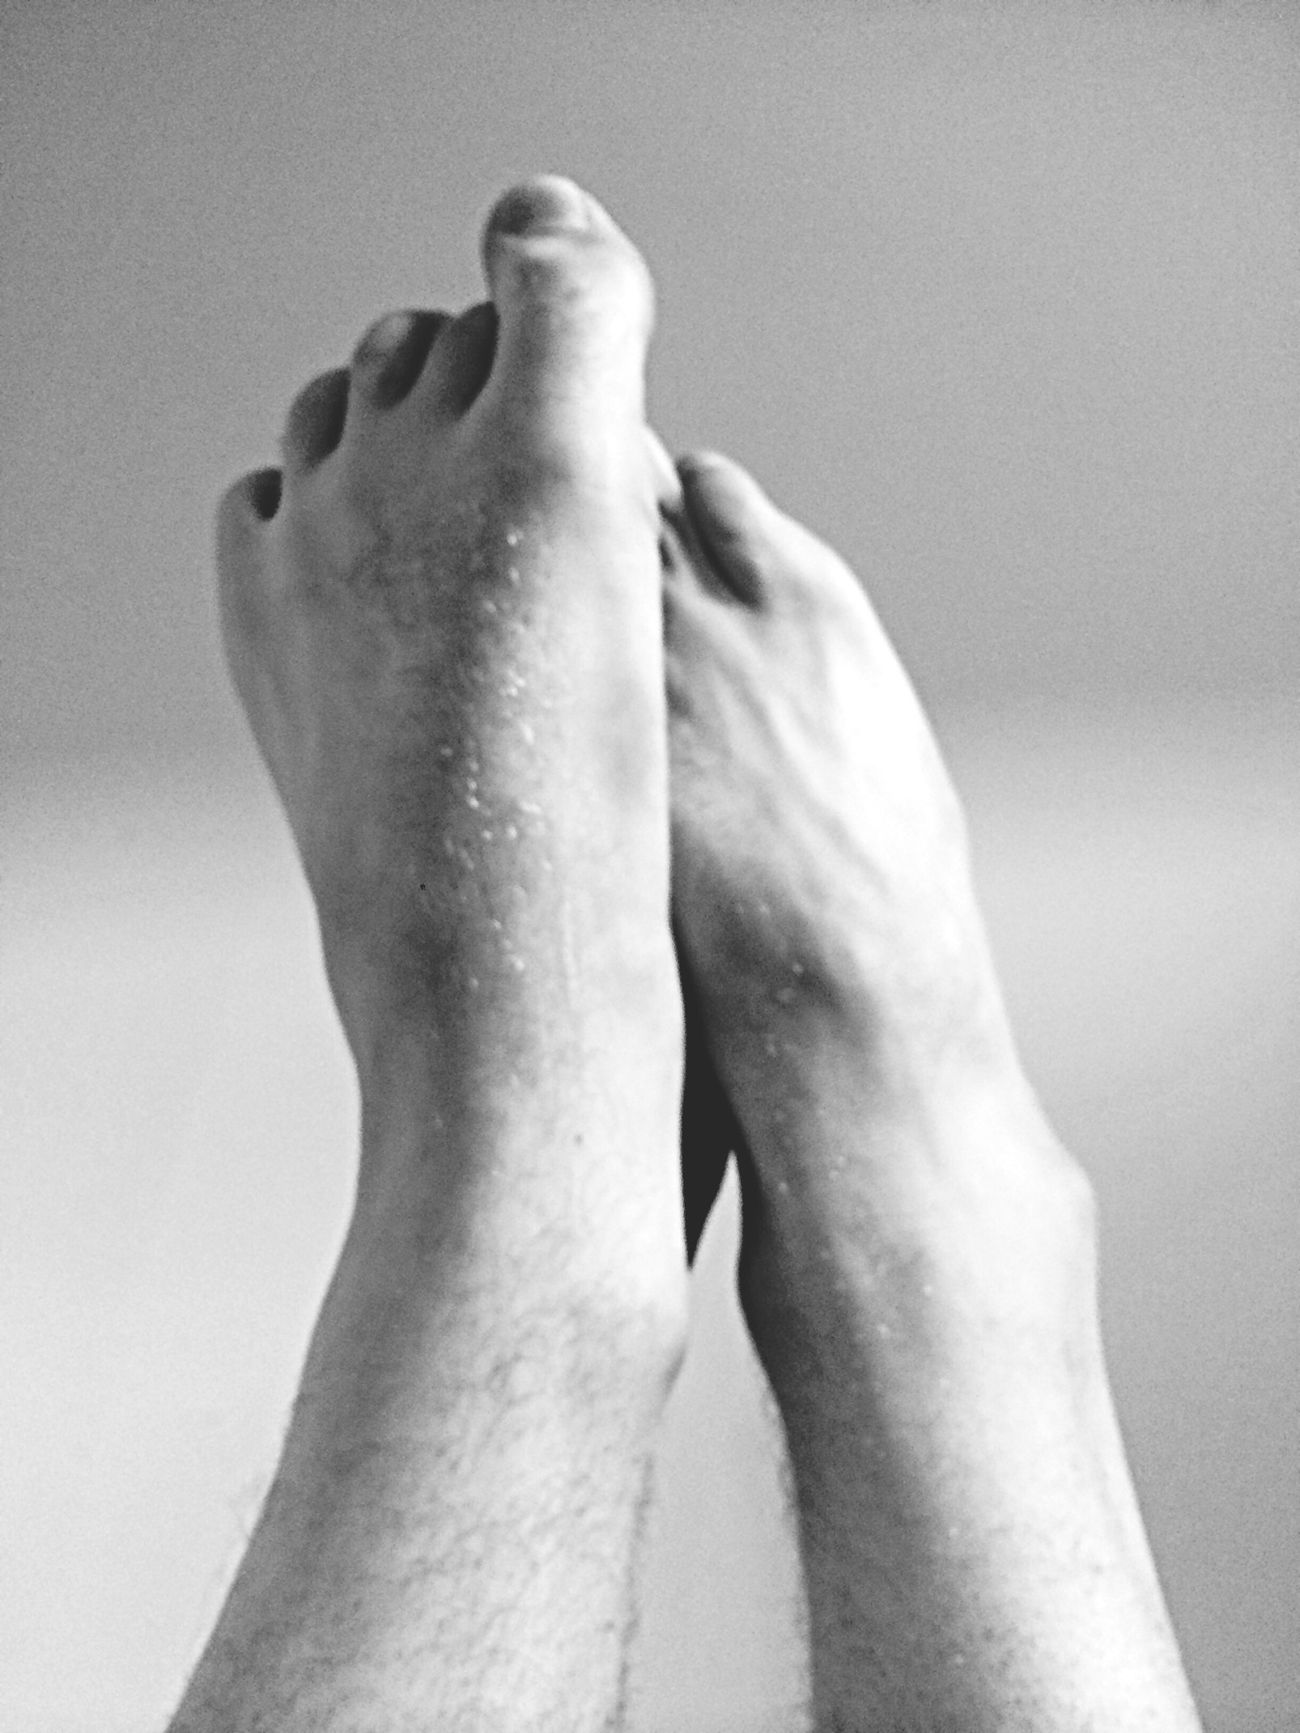 foot-in-foot